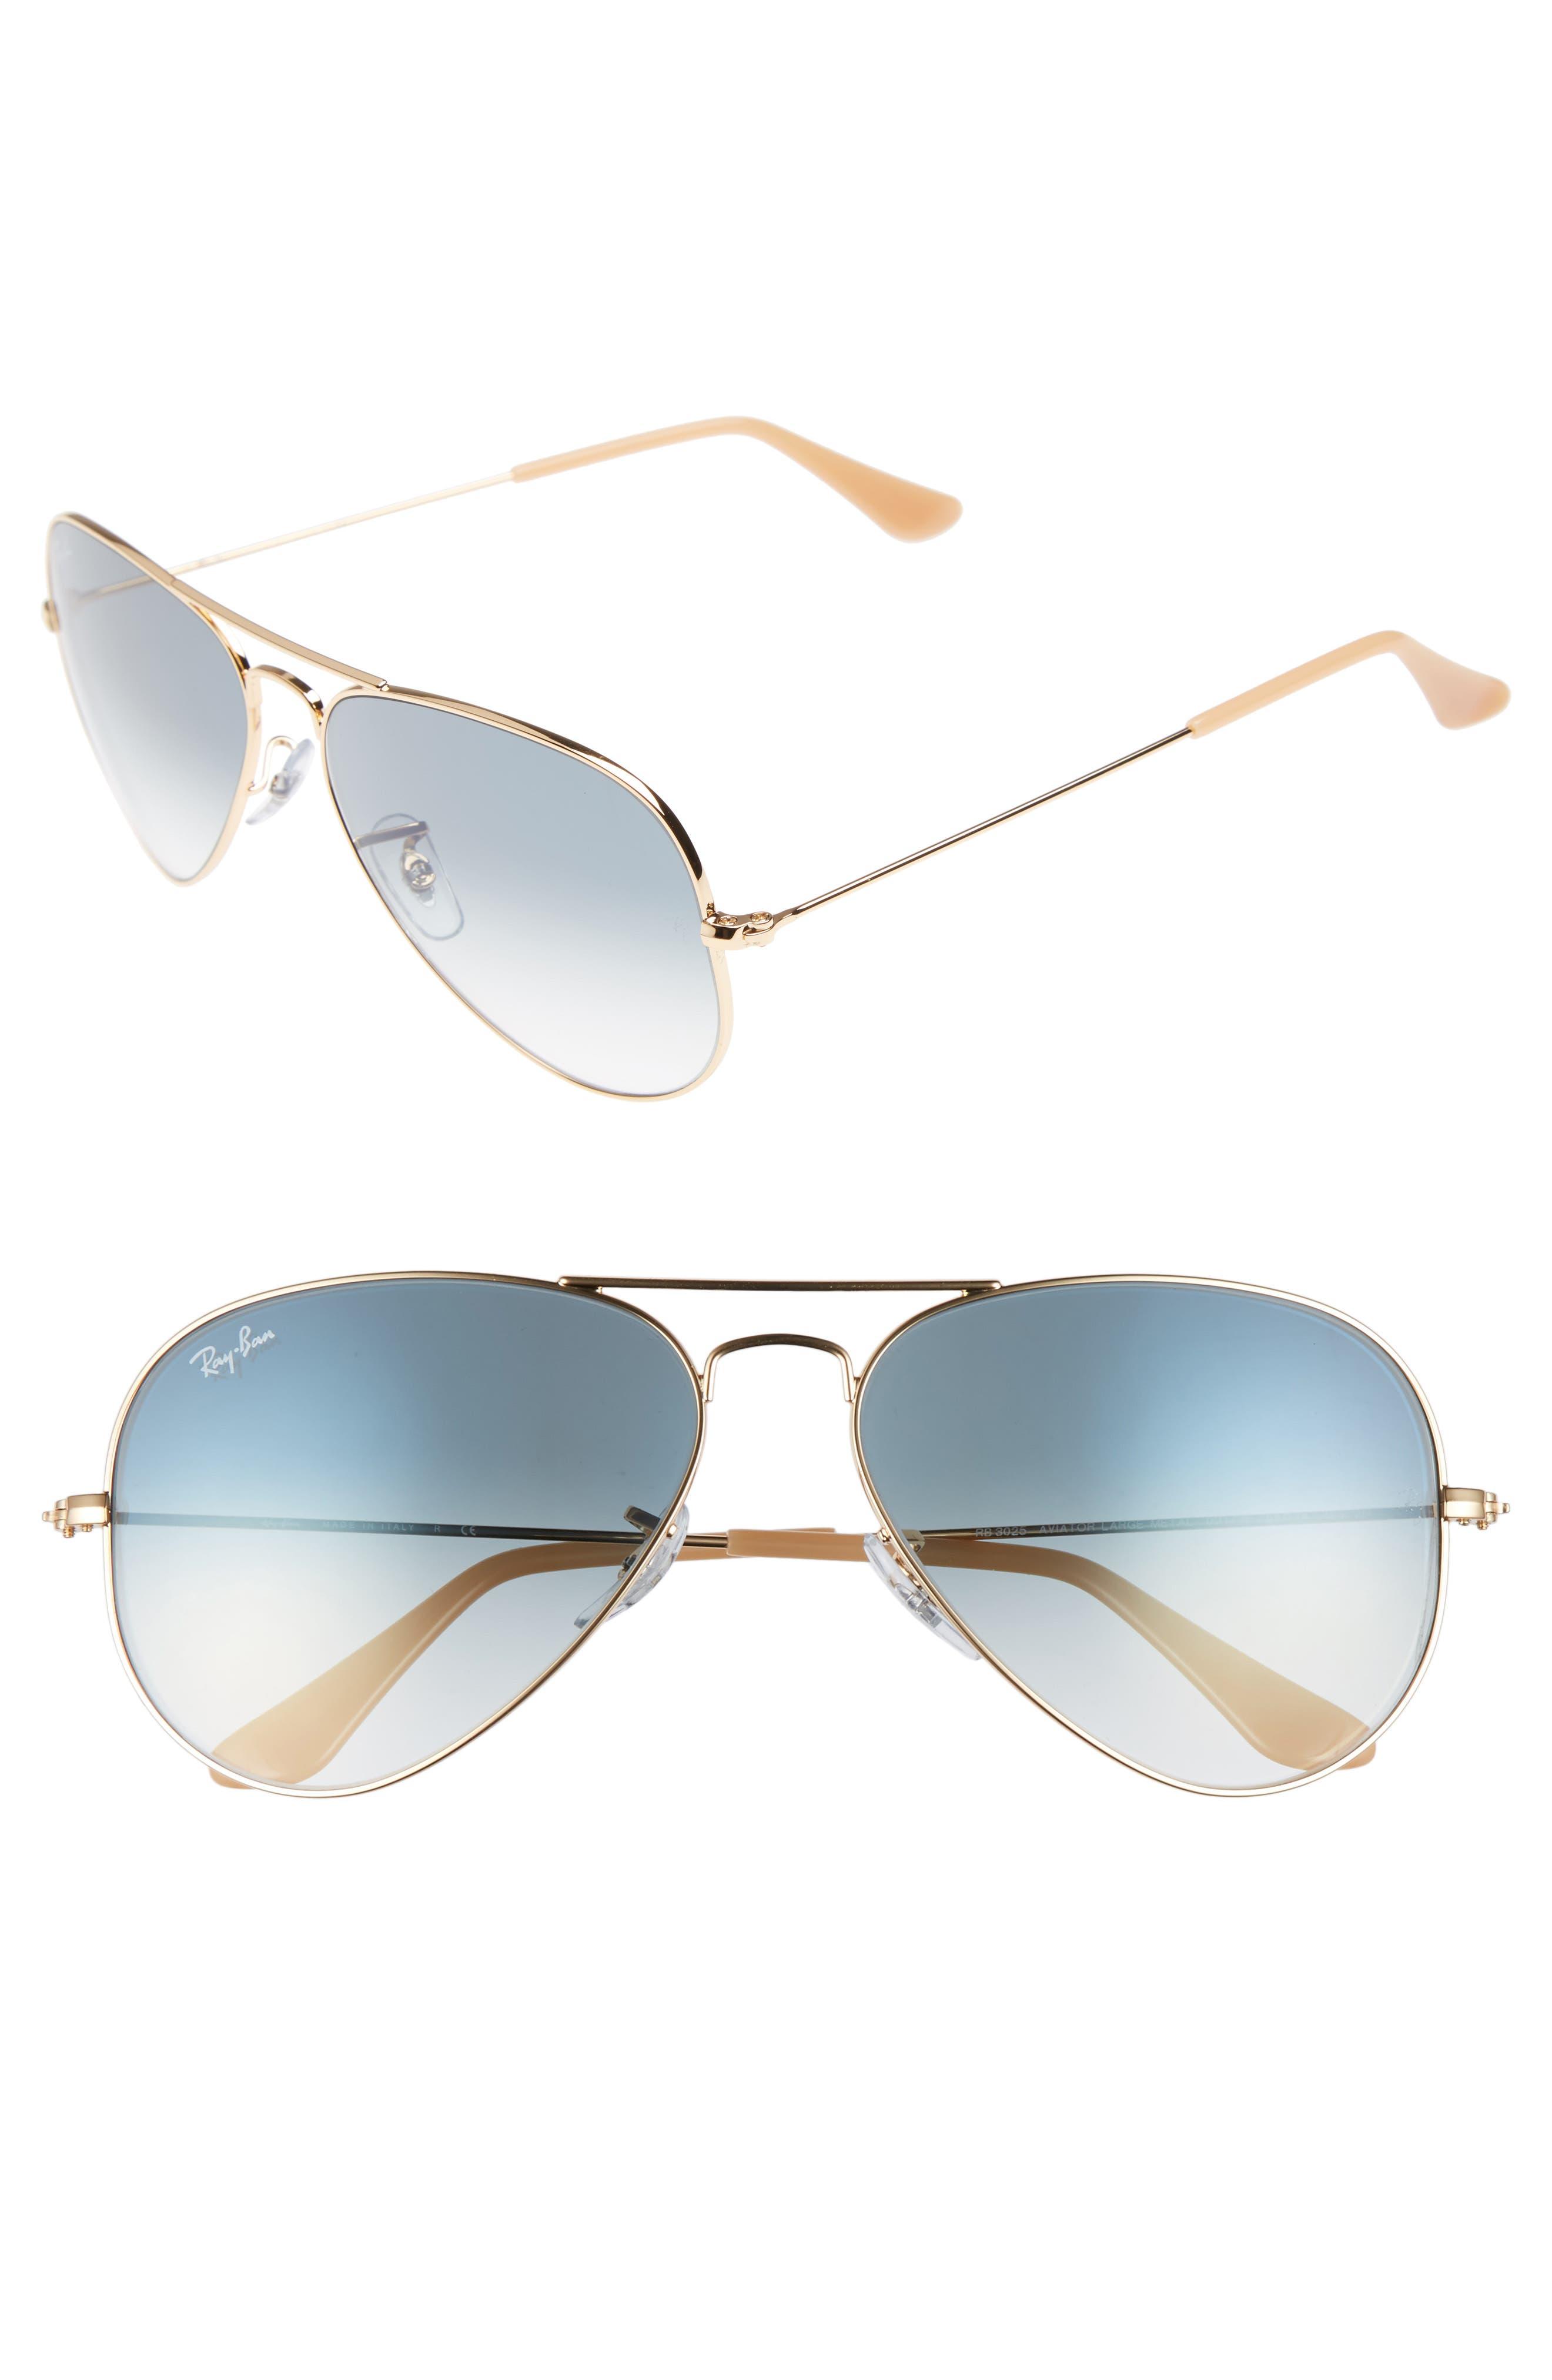 Original Aviator 58mm Sunglasses,                         Main,                         color, Matte Gold/ Blue Mirror